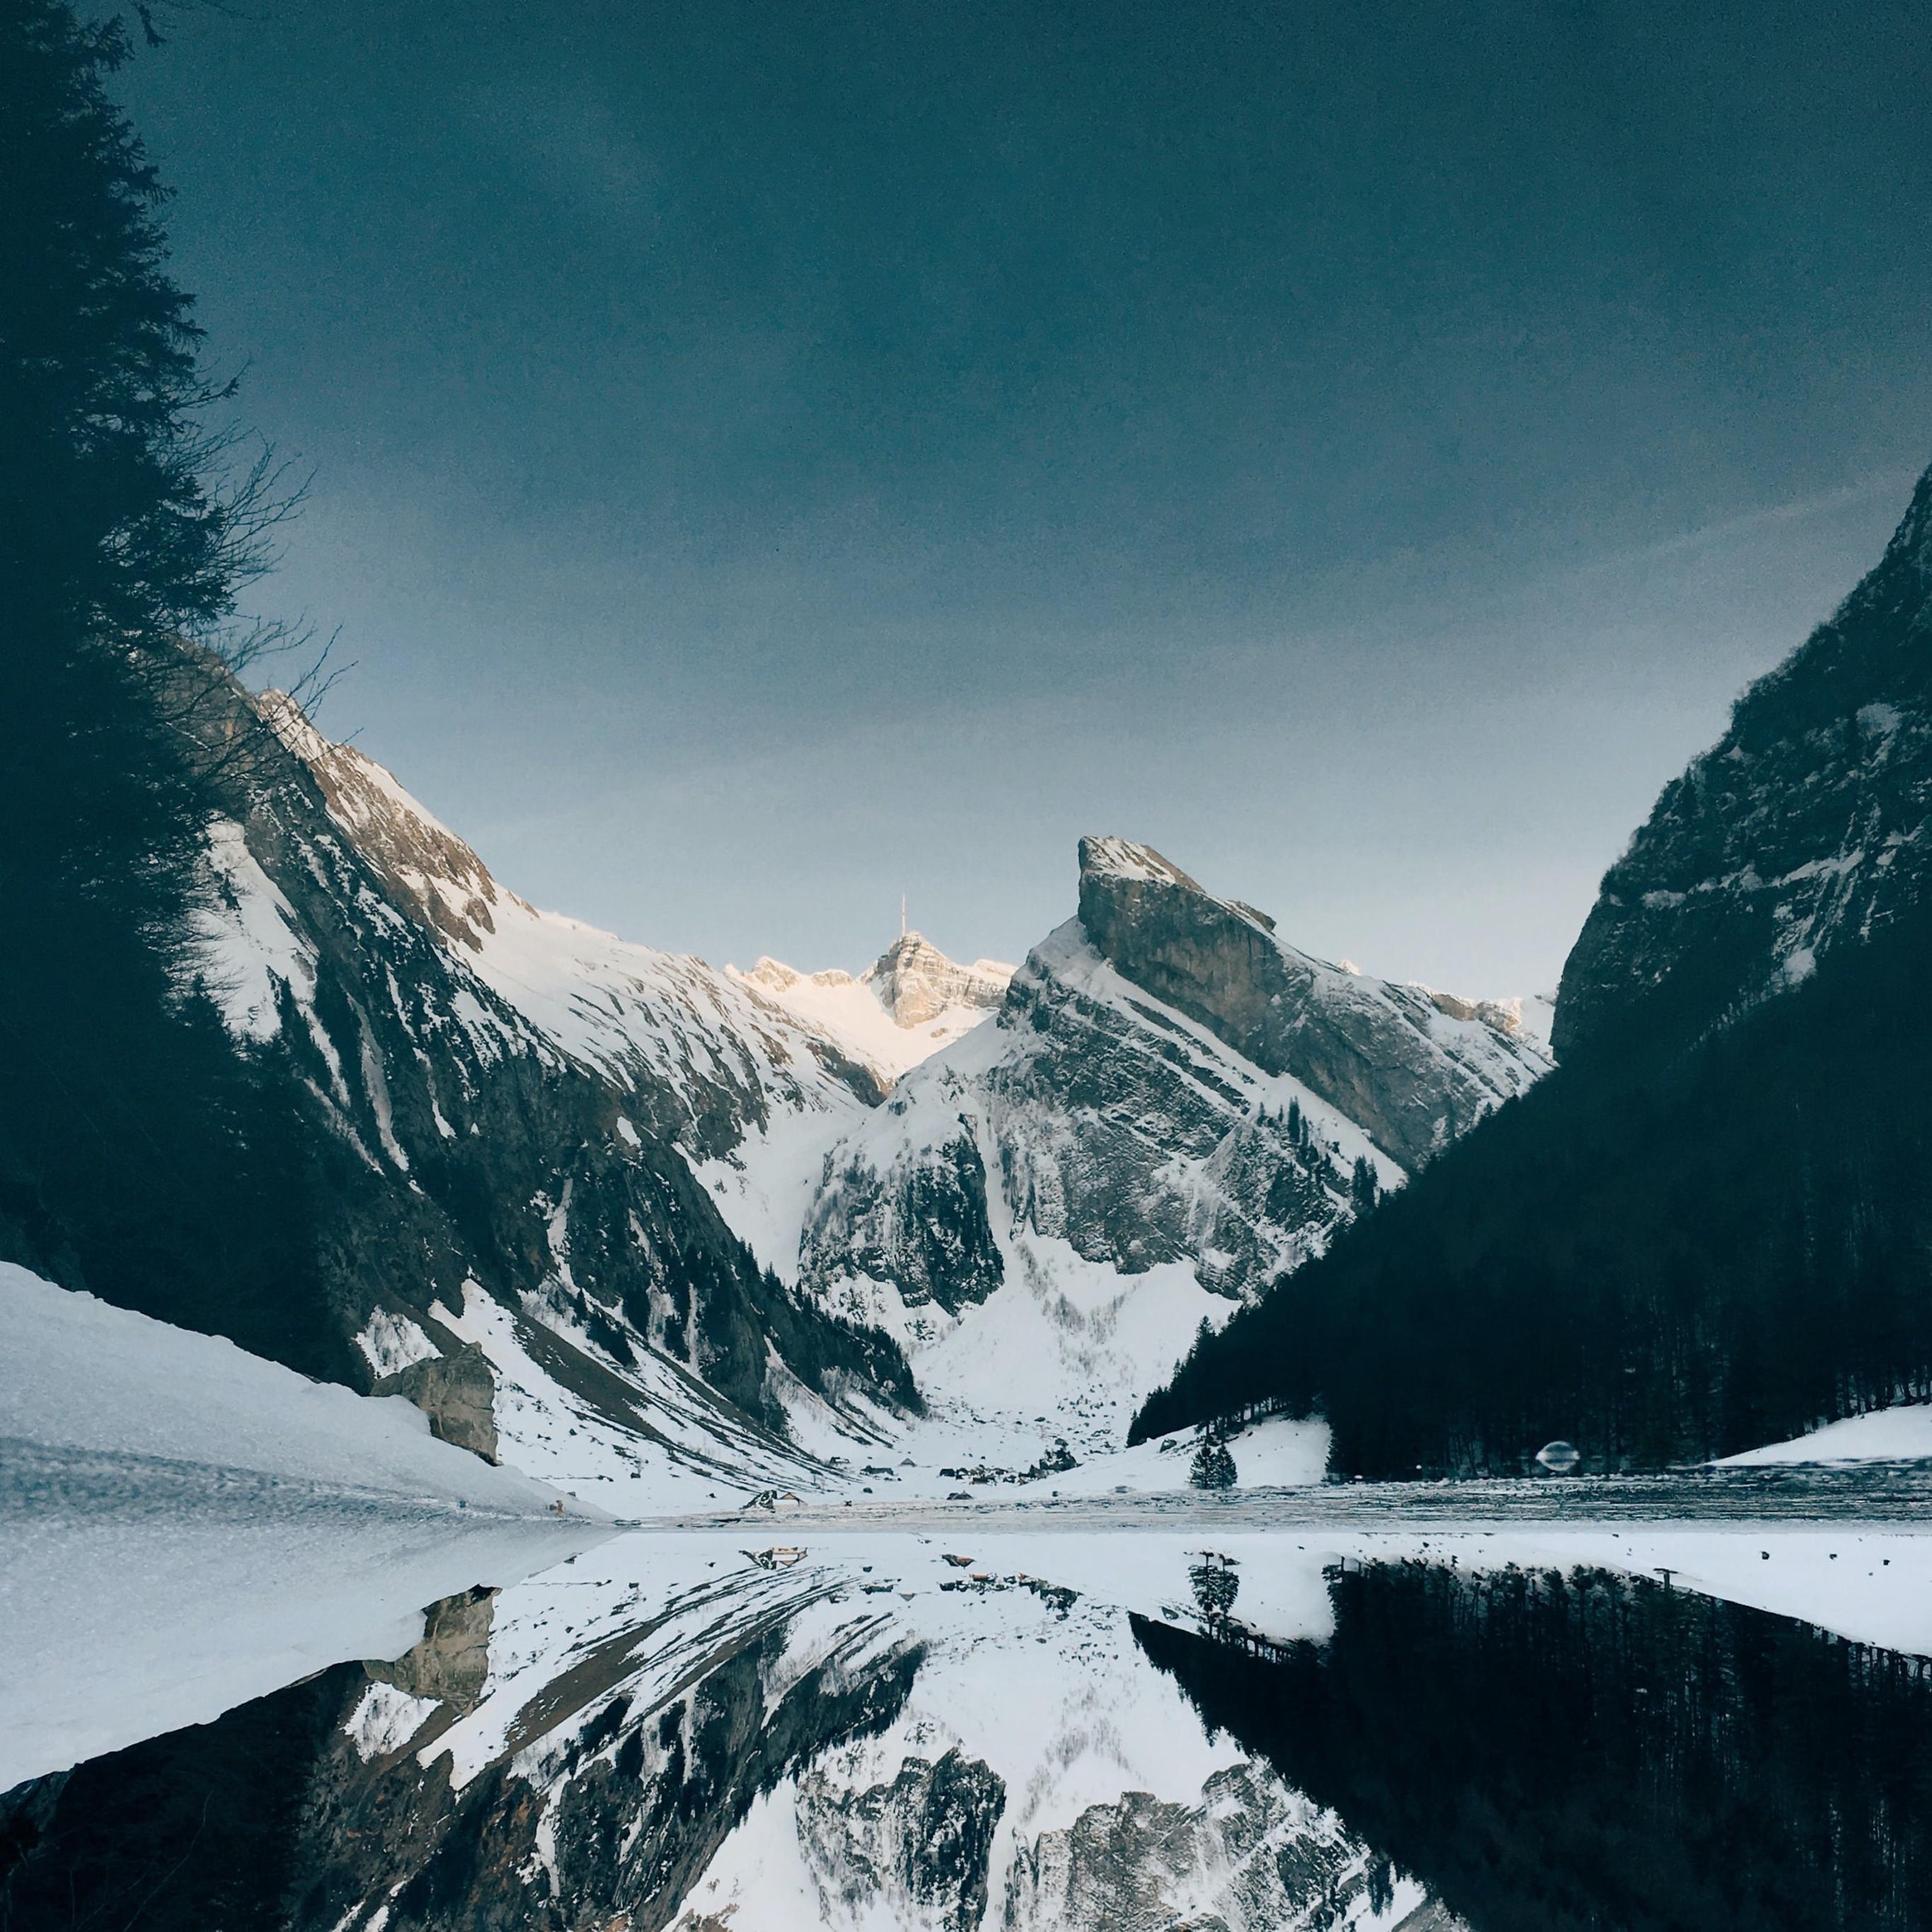 snow wallpaper mountain lake idownloadblog unsplash fynn ipad